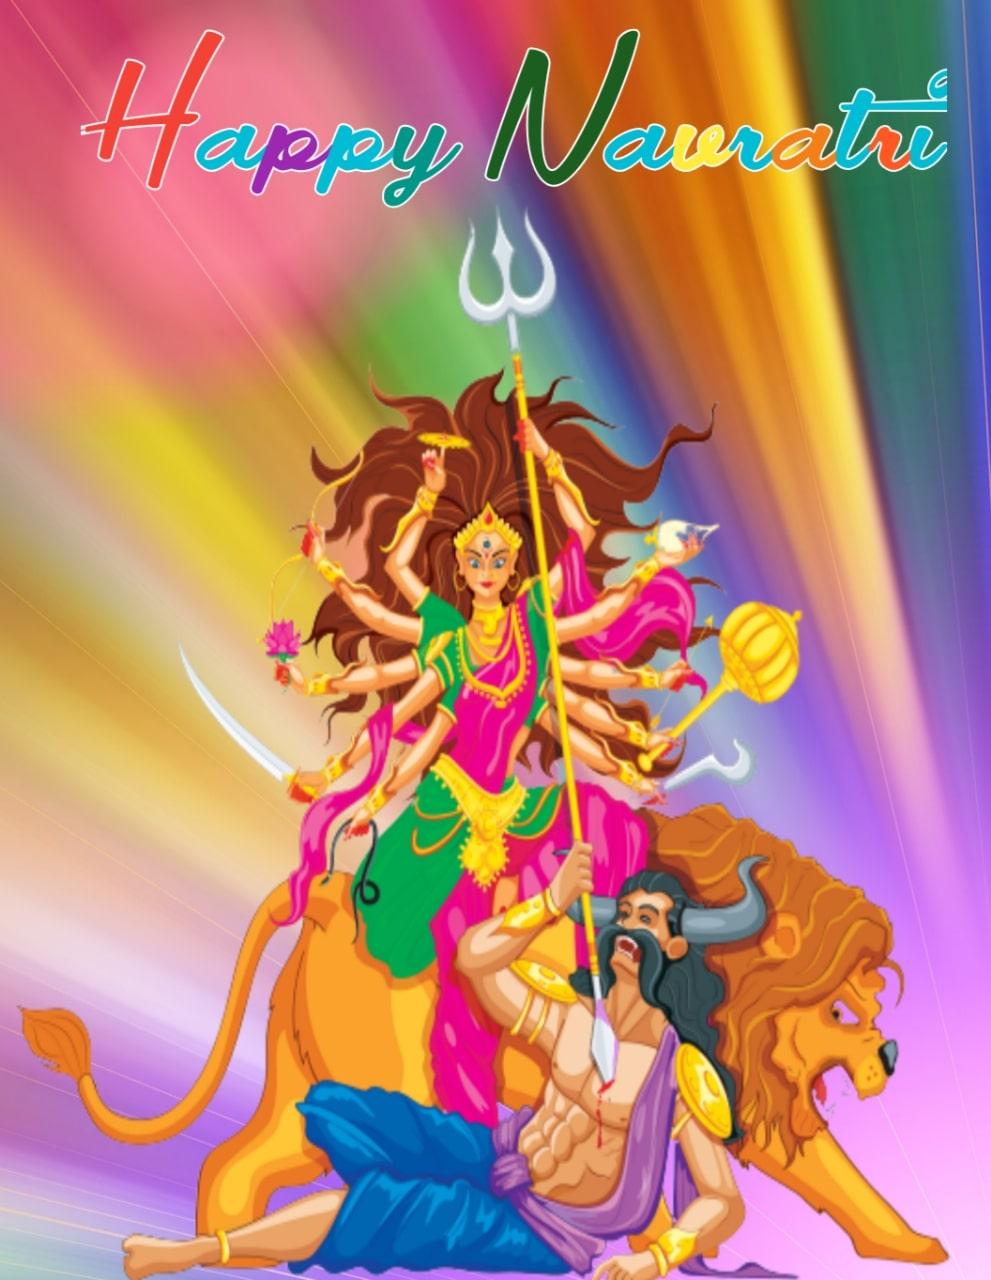 Happy navratri images in Hindi